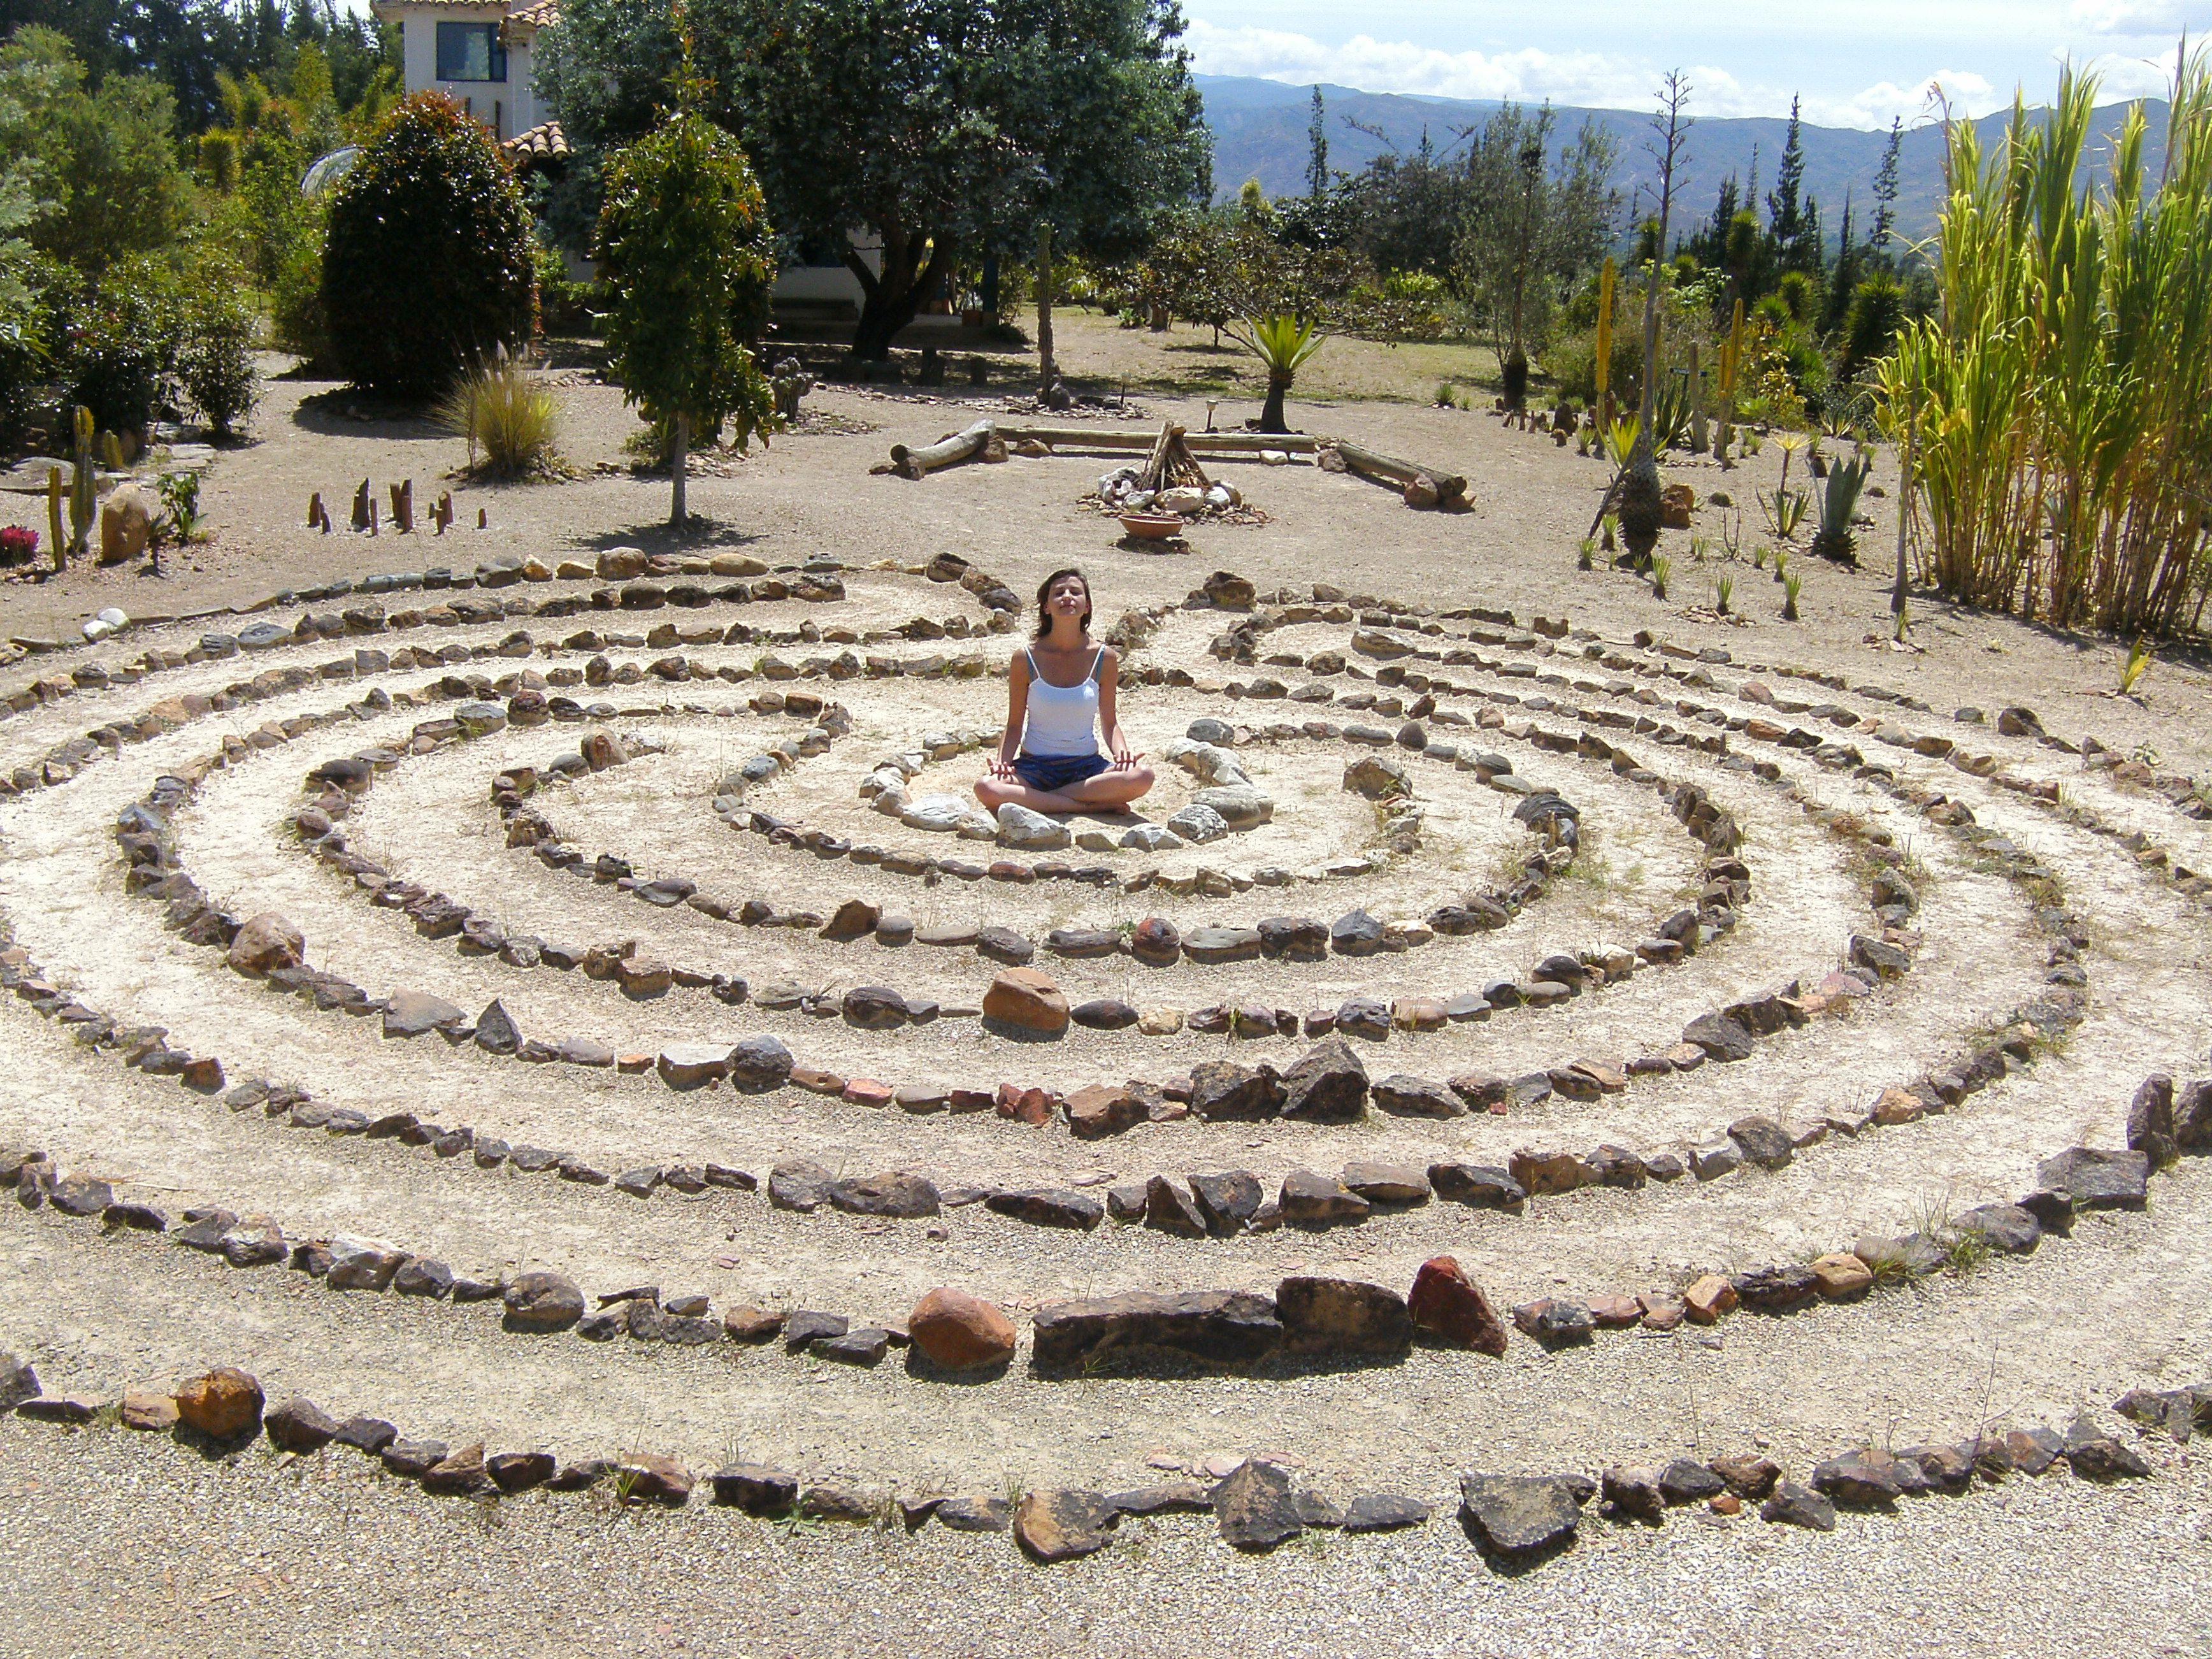 Art fibas jard n de desierto laberinto de meditaci n for Jardin laberinto